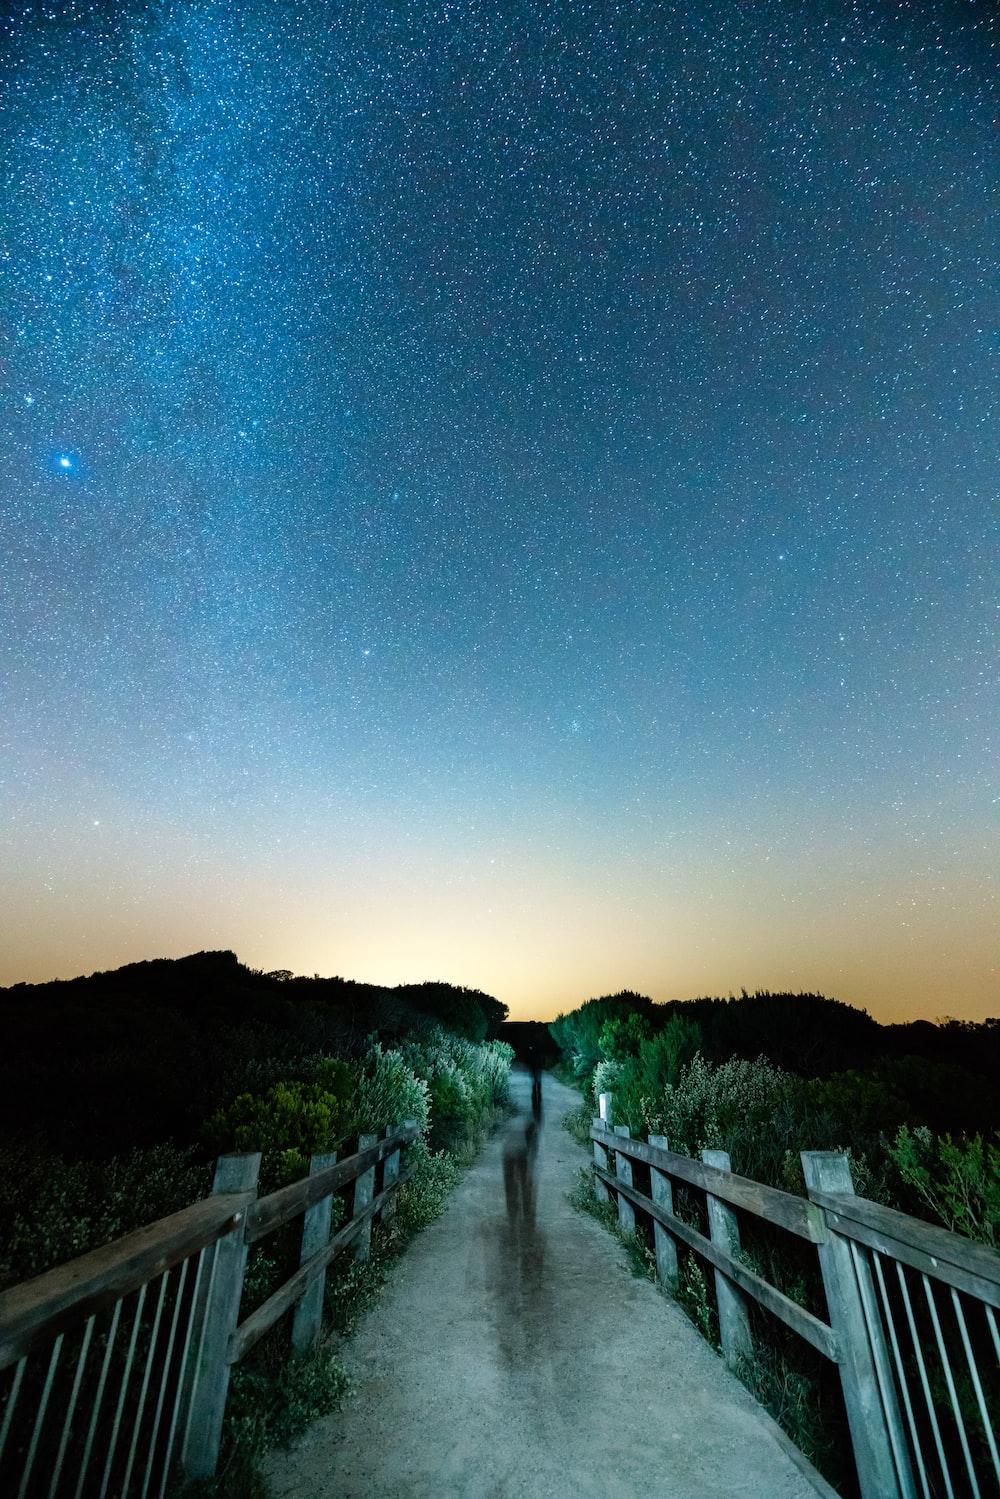 gray wooden bridge under night sky